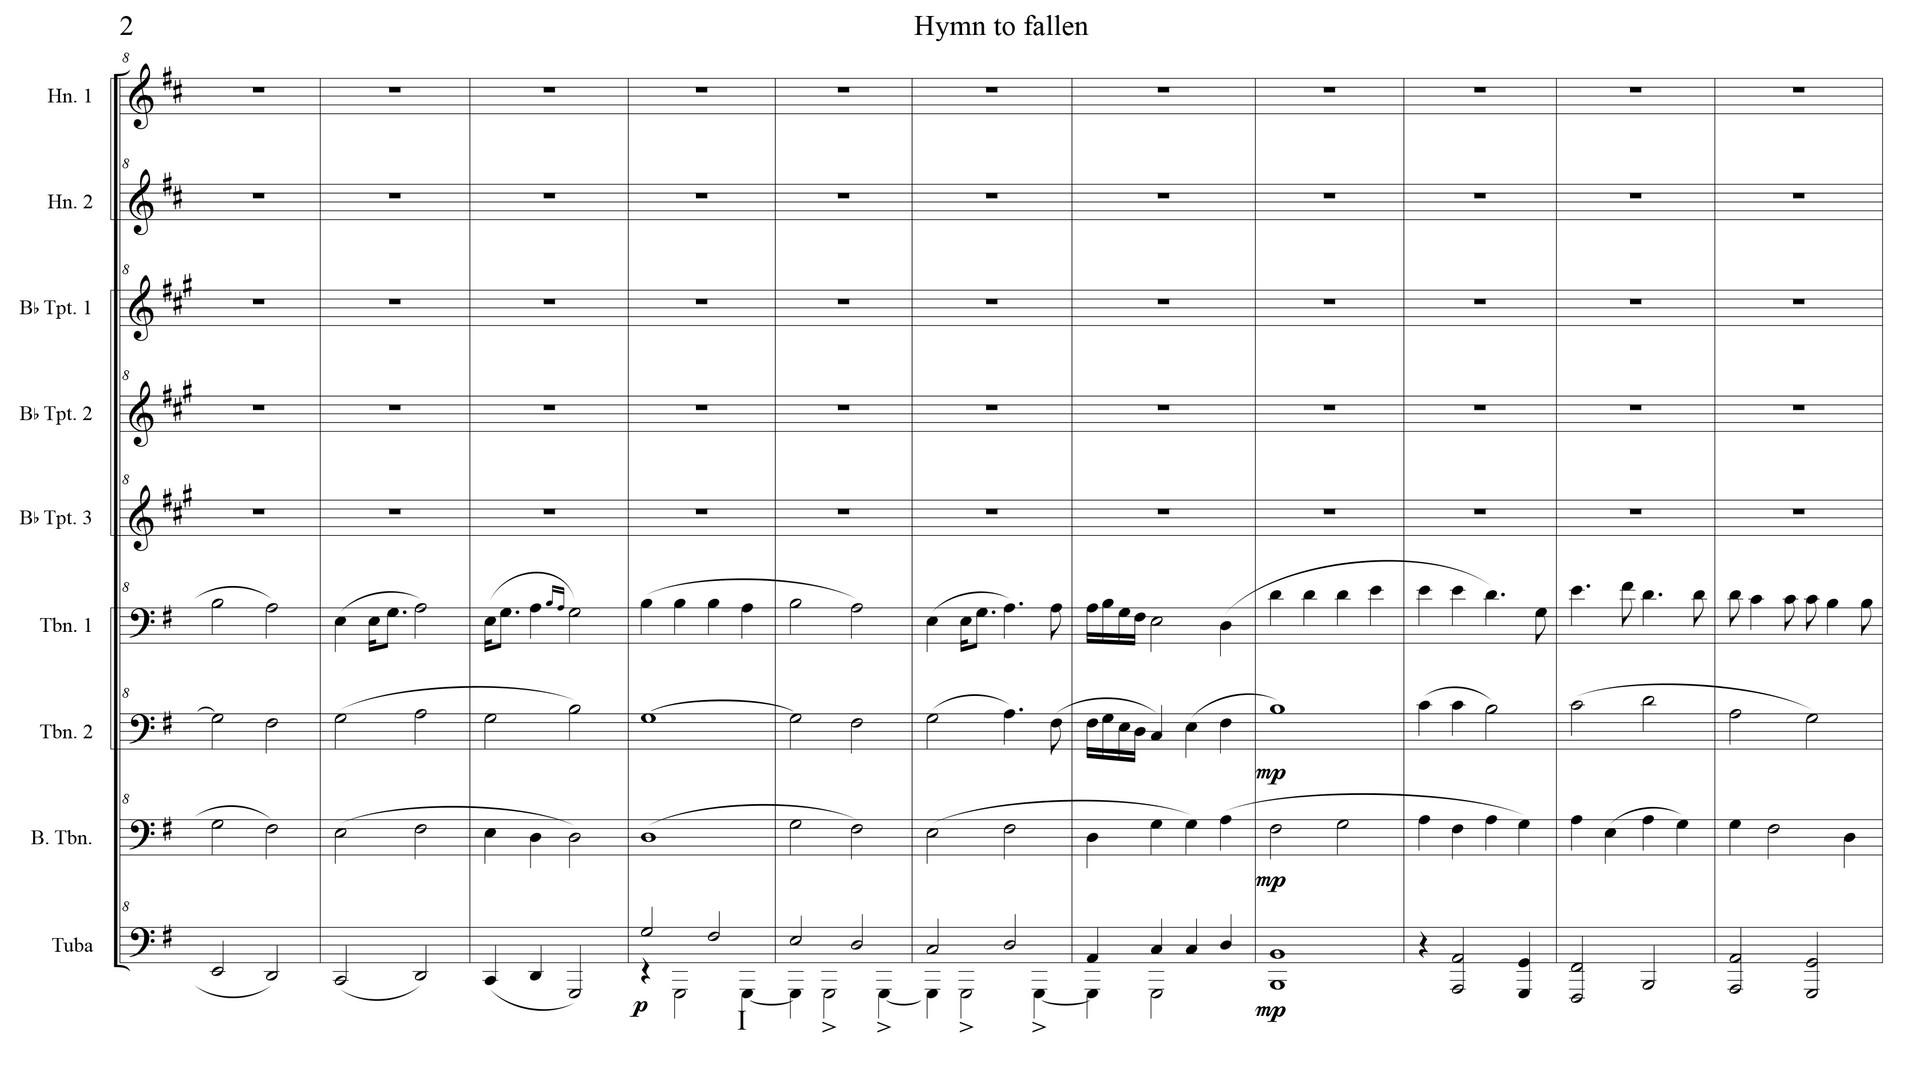 2.Hymn to Fall_BSM-2.jpg